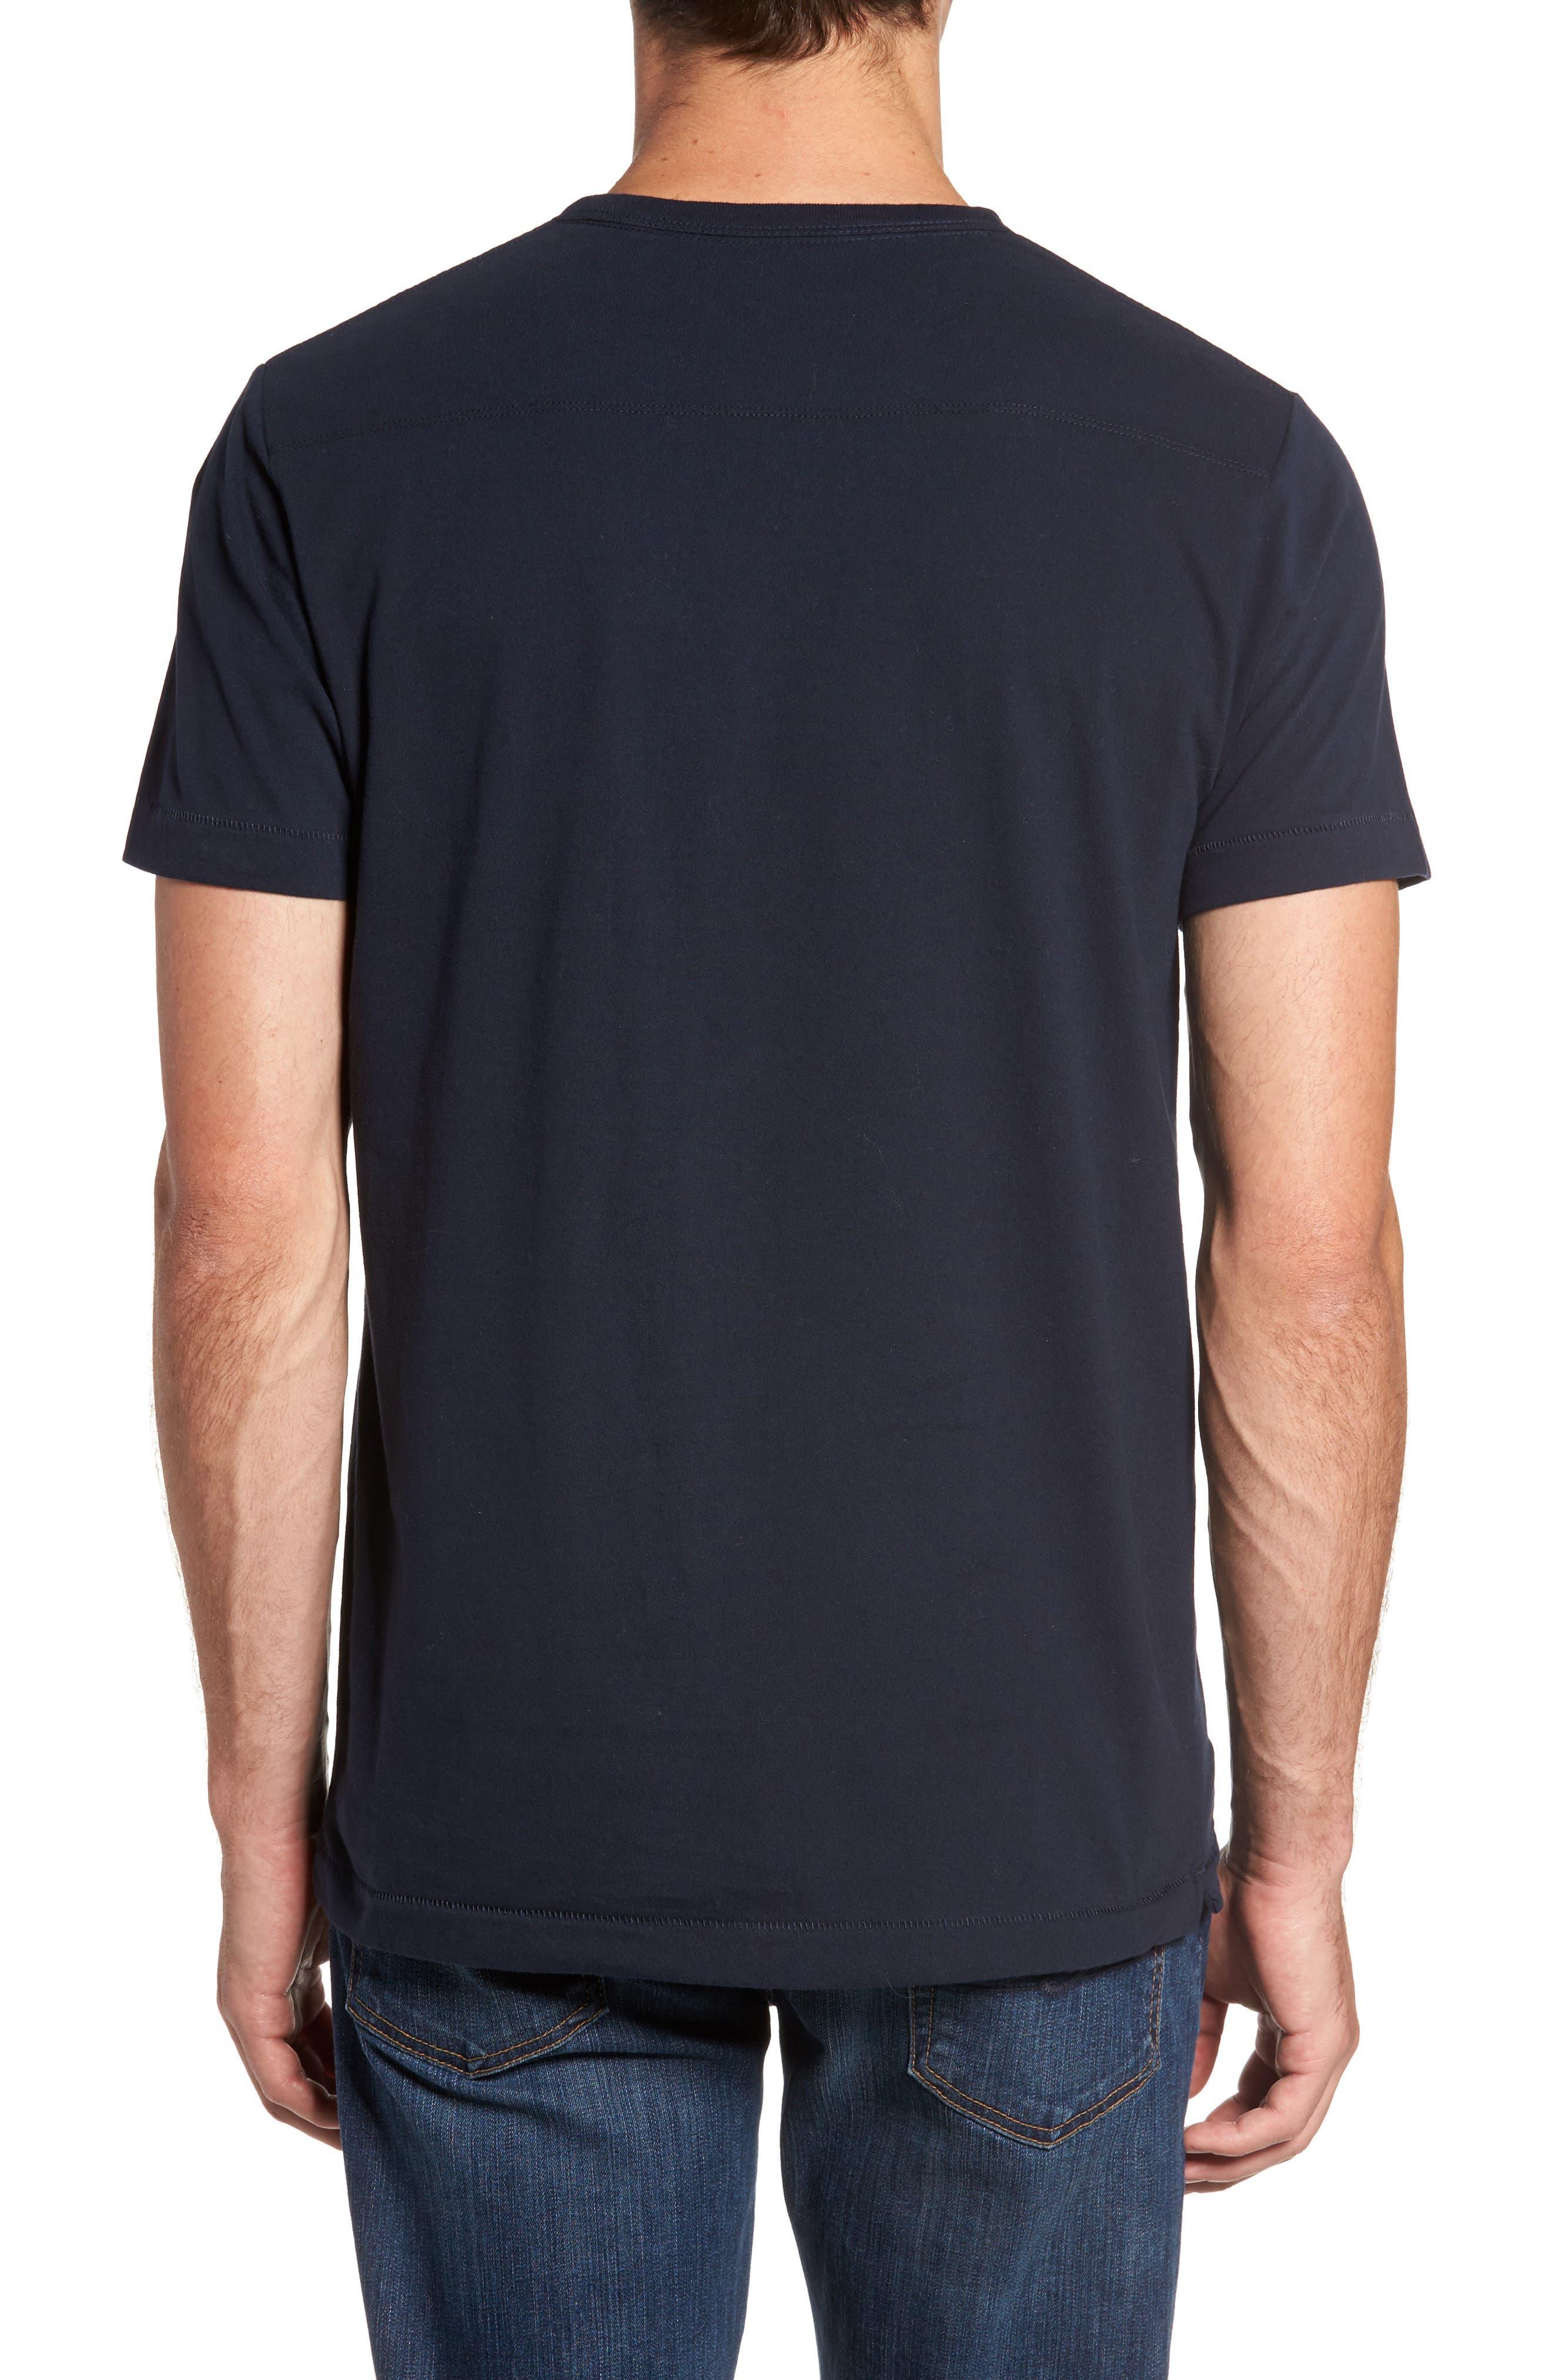 Comme Ci Comme Ça Regular Fit T-Shirt,                             Alternate thumbnail 2, color,                             Marine Blue/ White